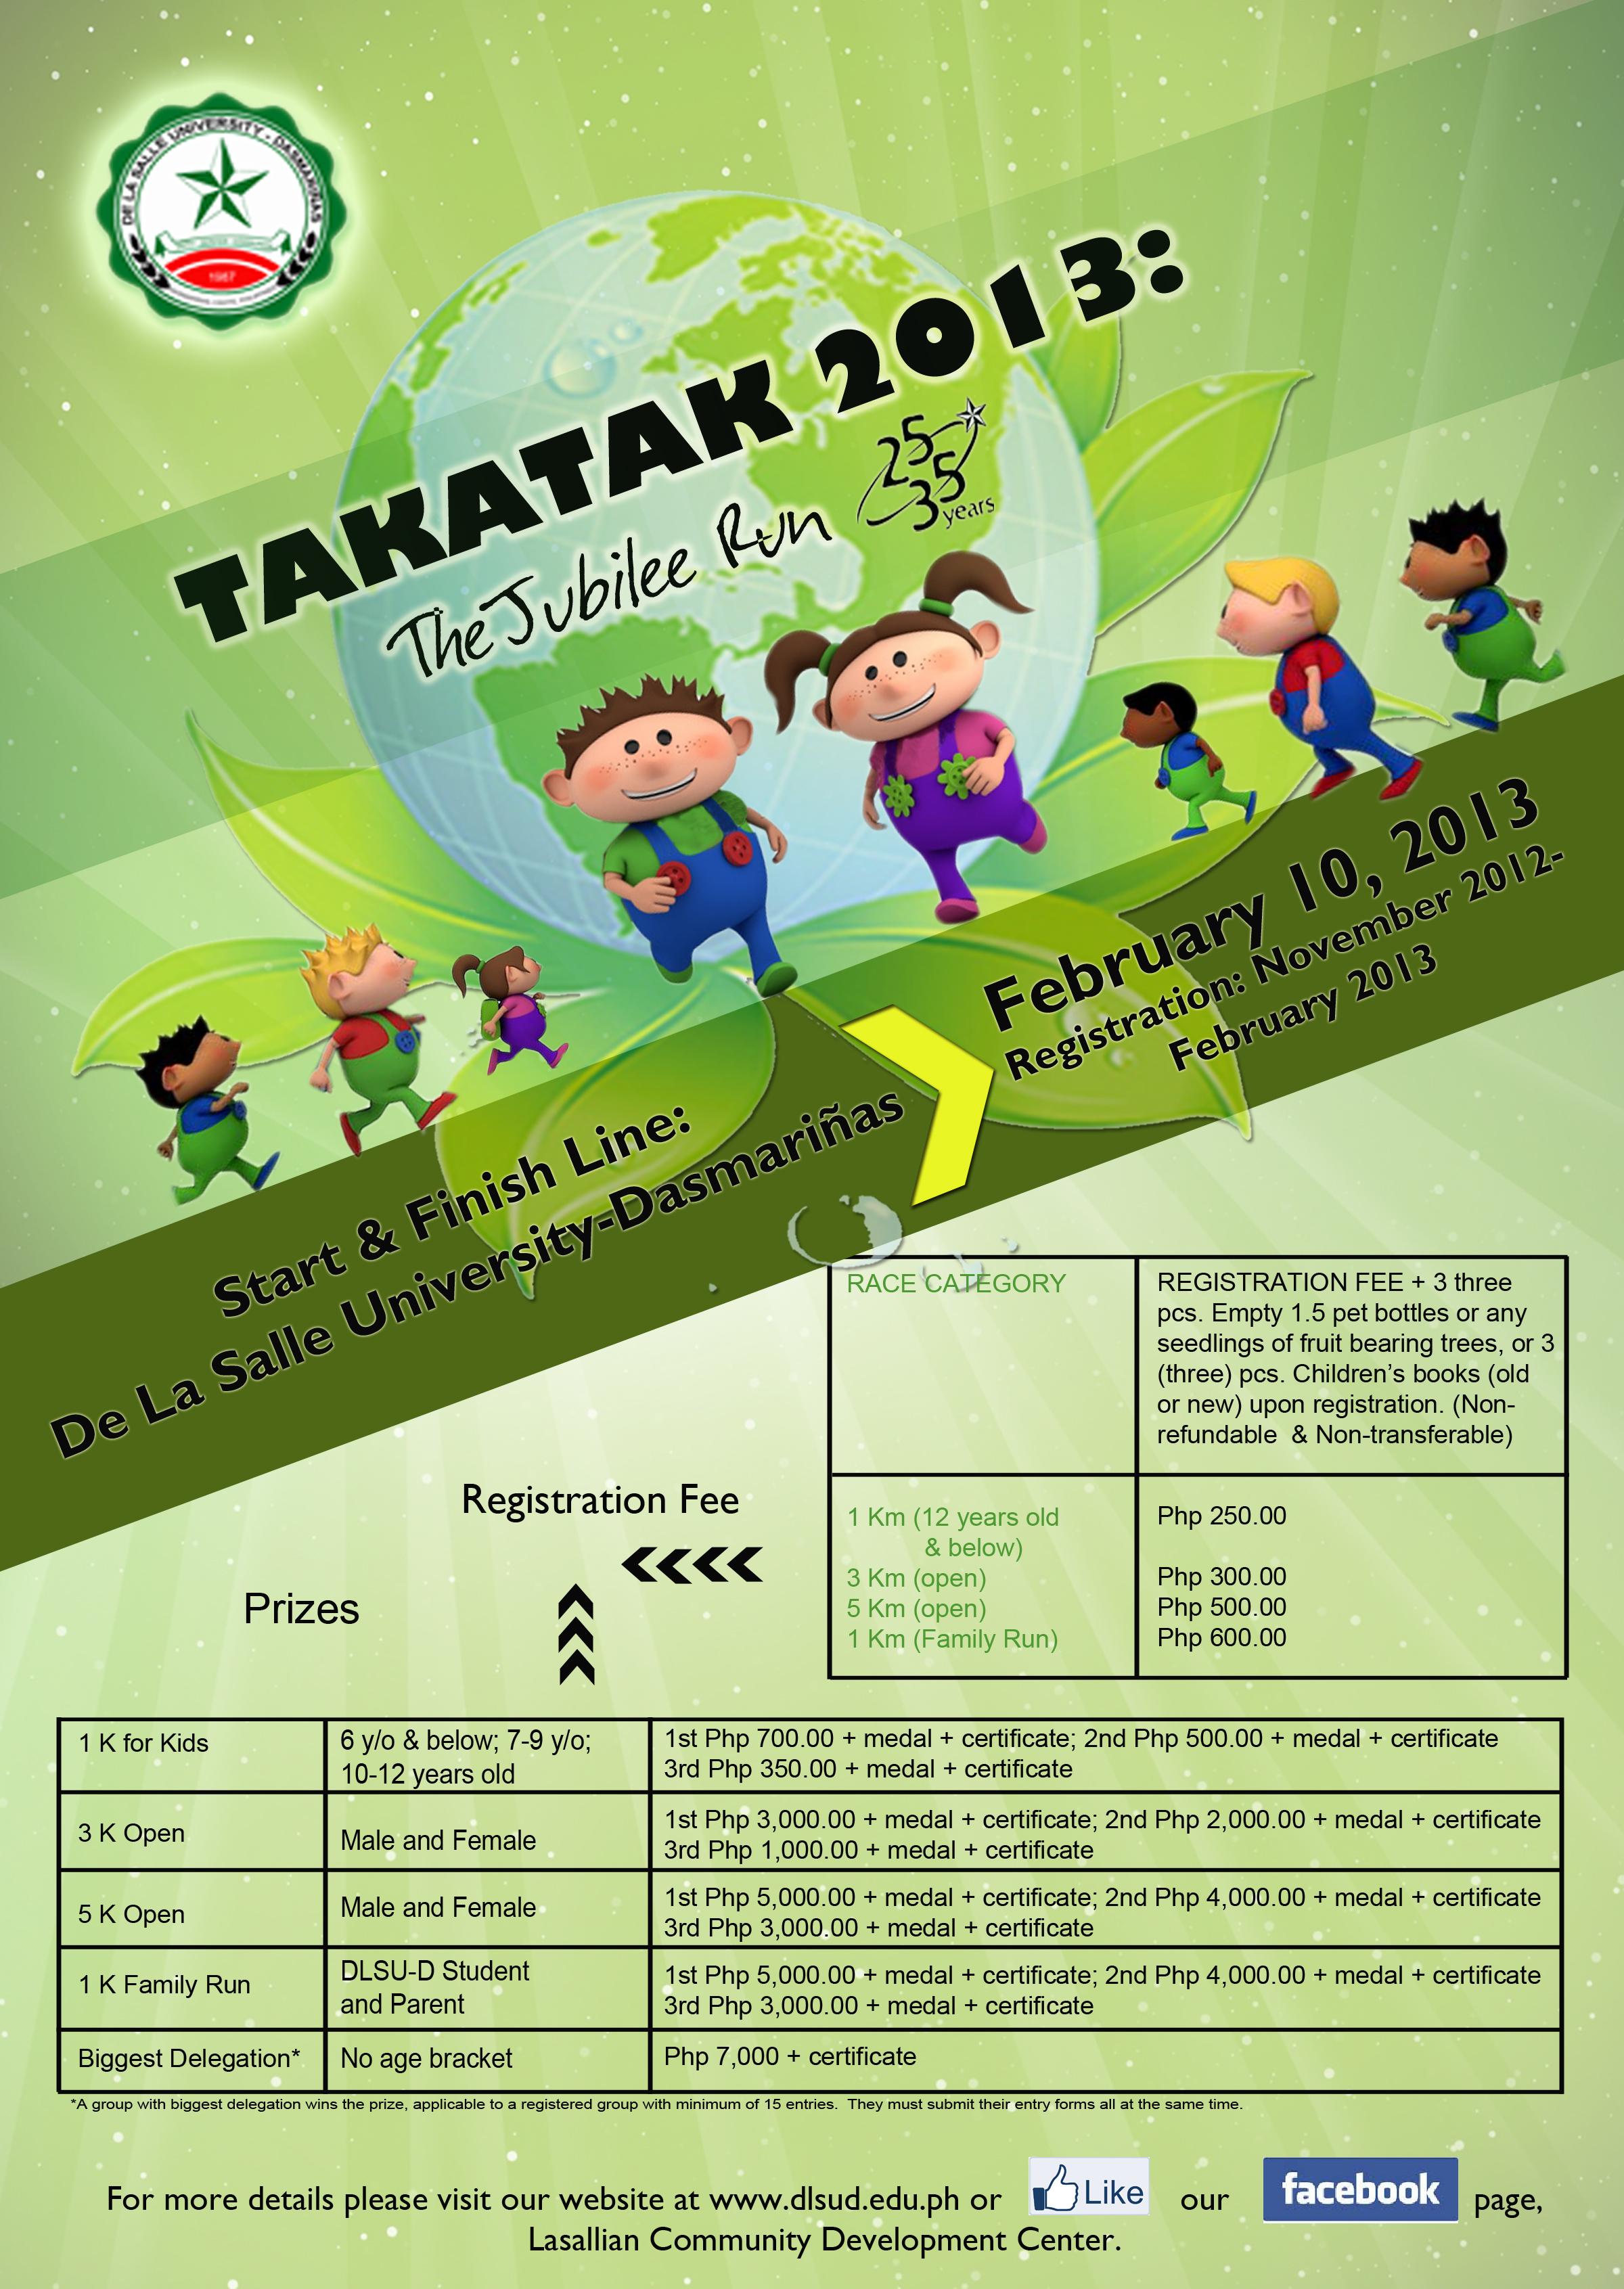 takatak-2013-poster